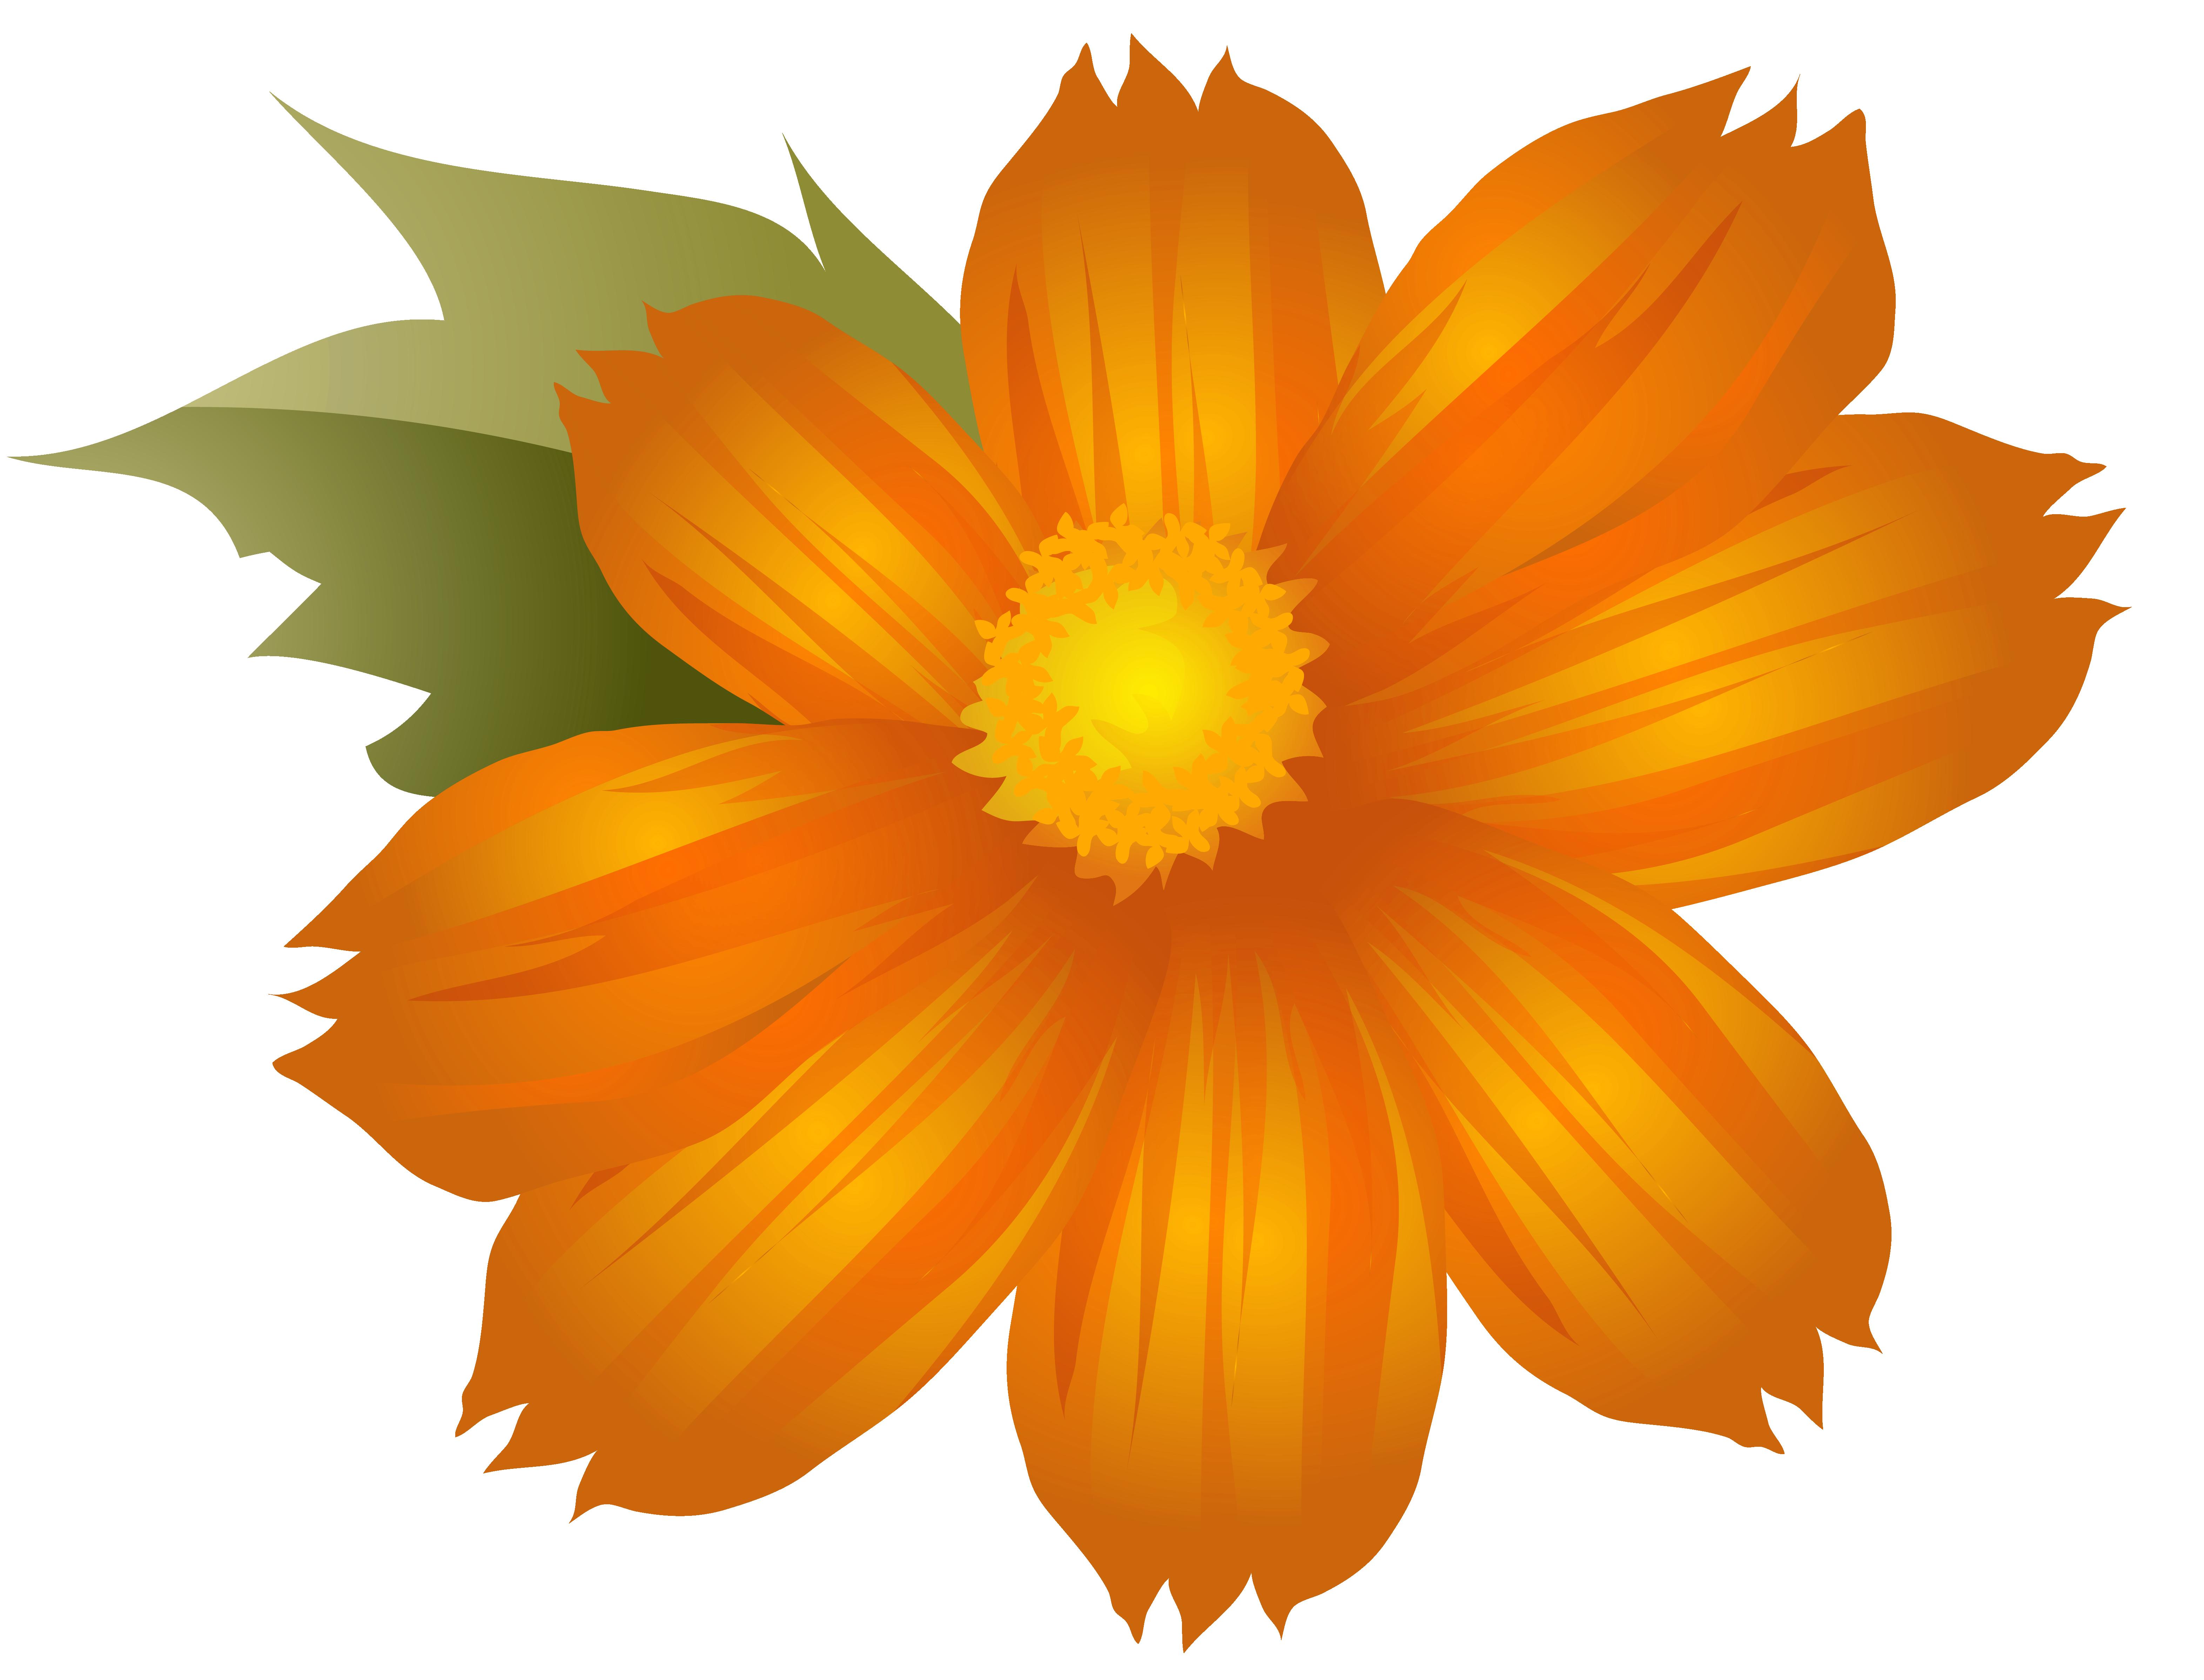 Orange Flower clipart #6, Download drawings